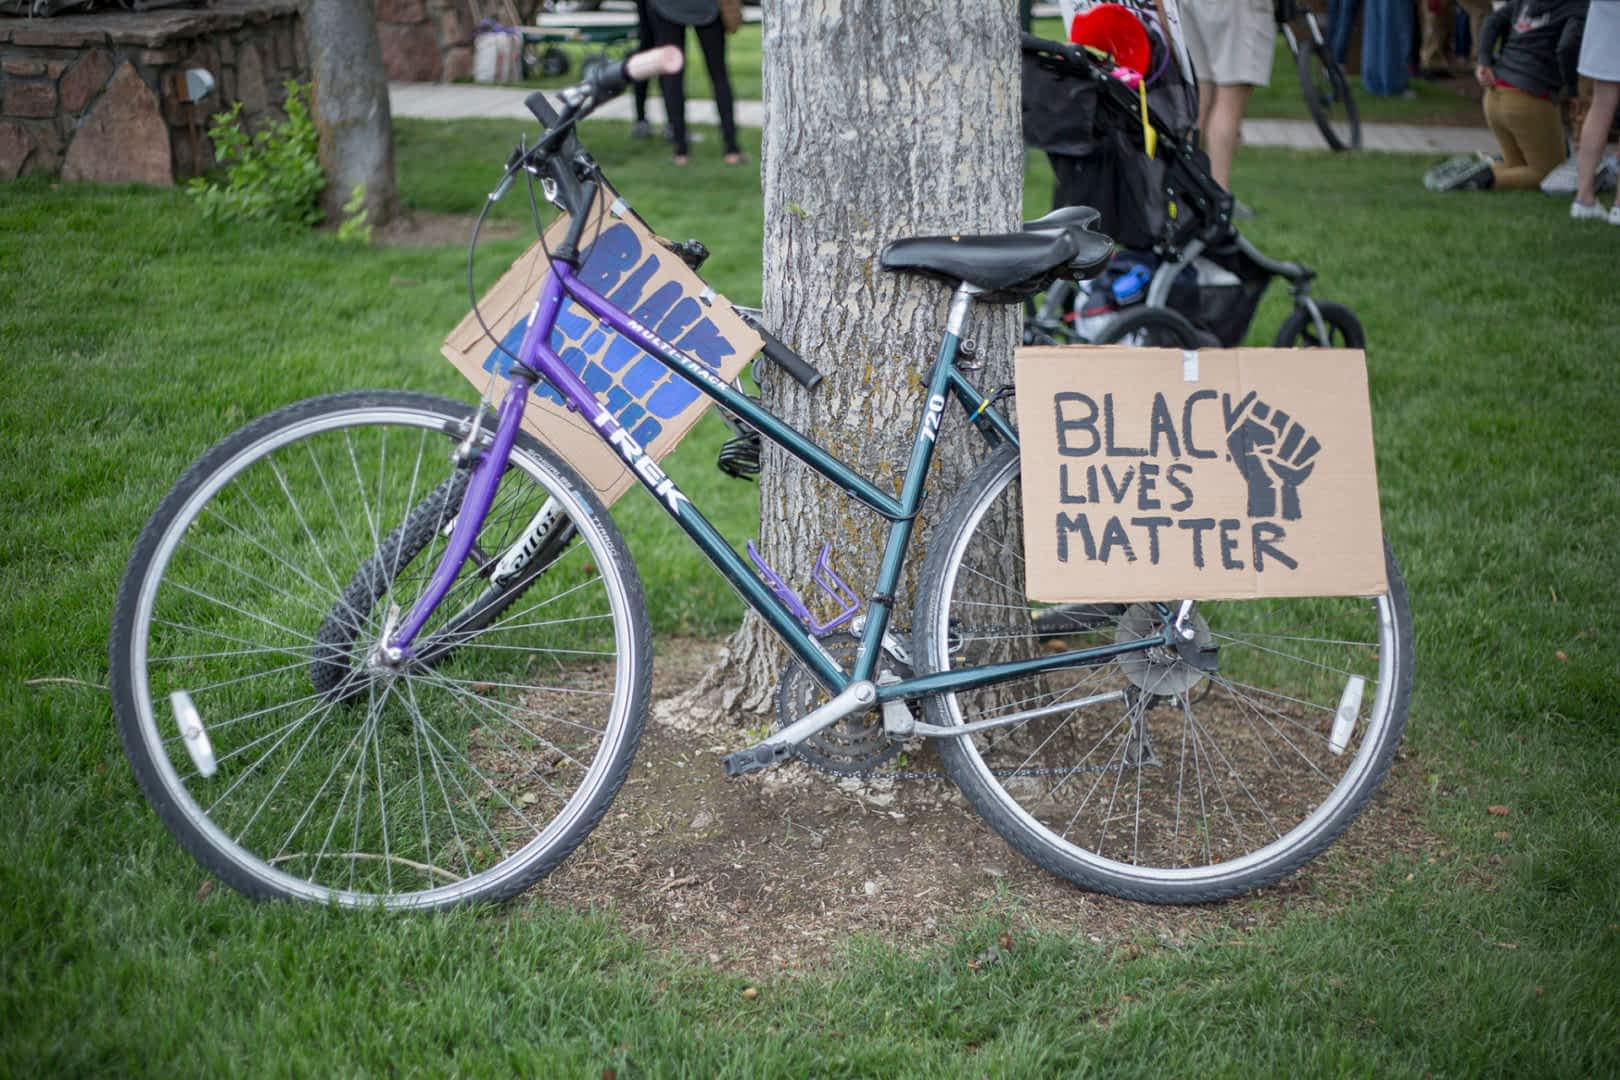 Cyclo-cross - Bicycle